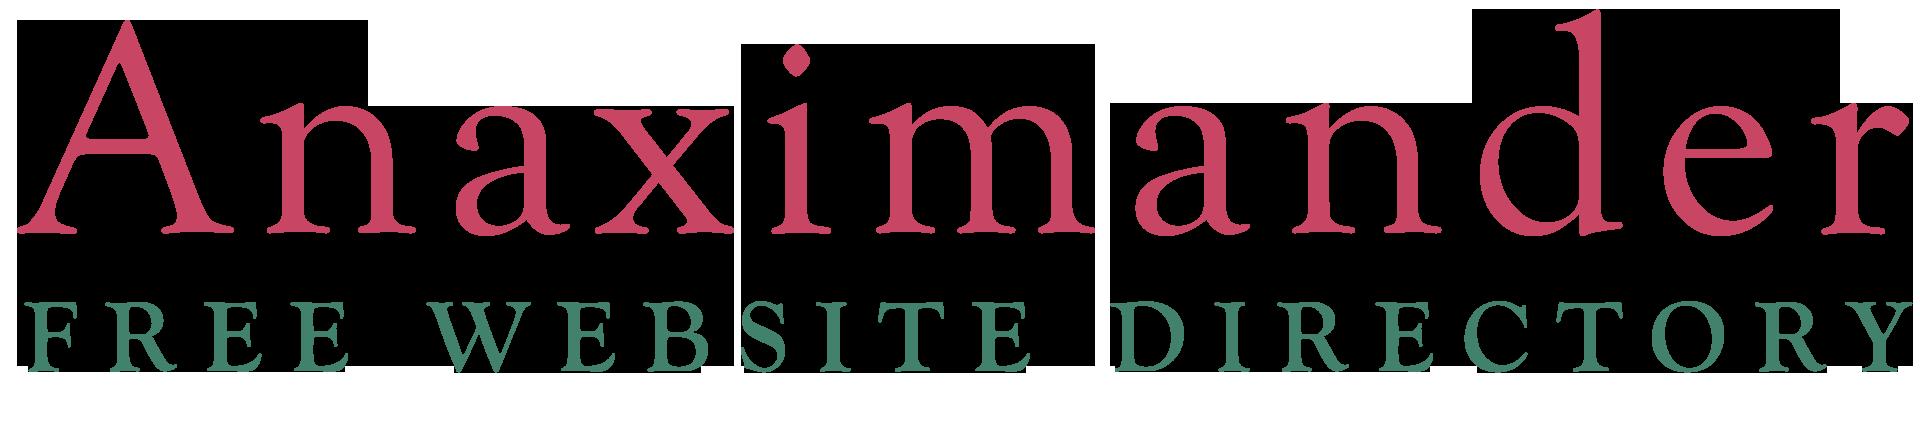 Anaximander Directory List